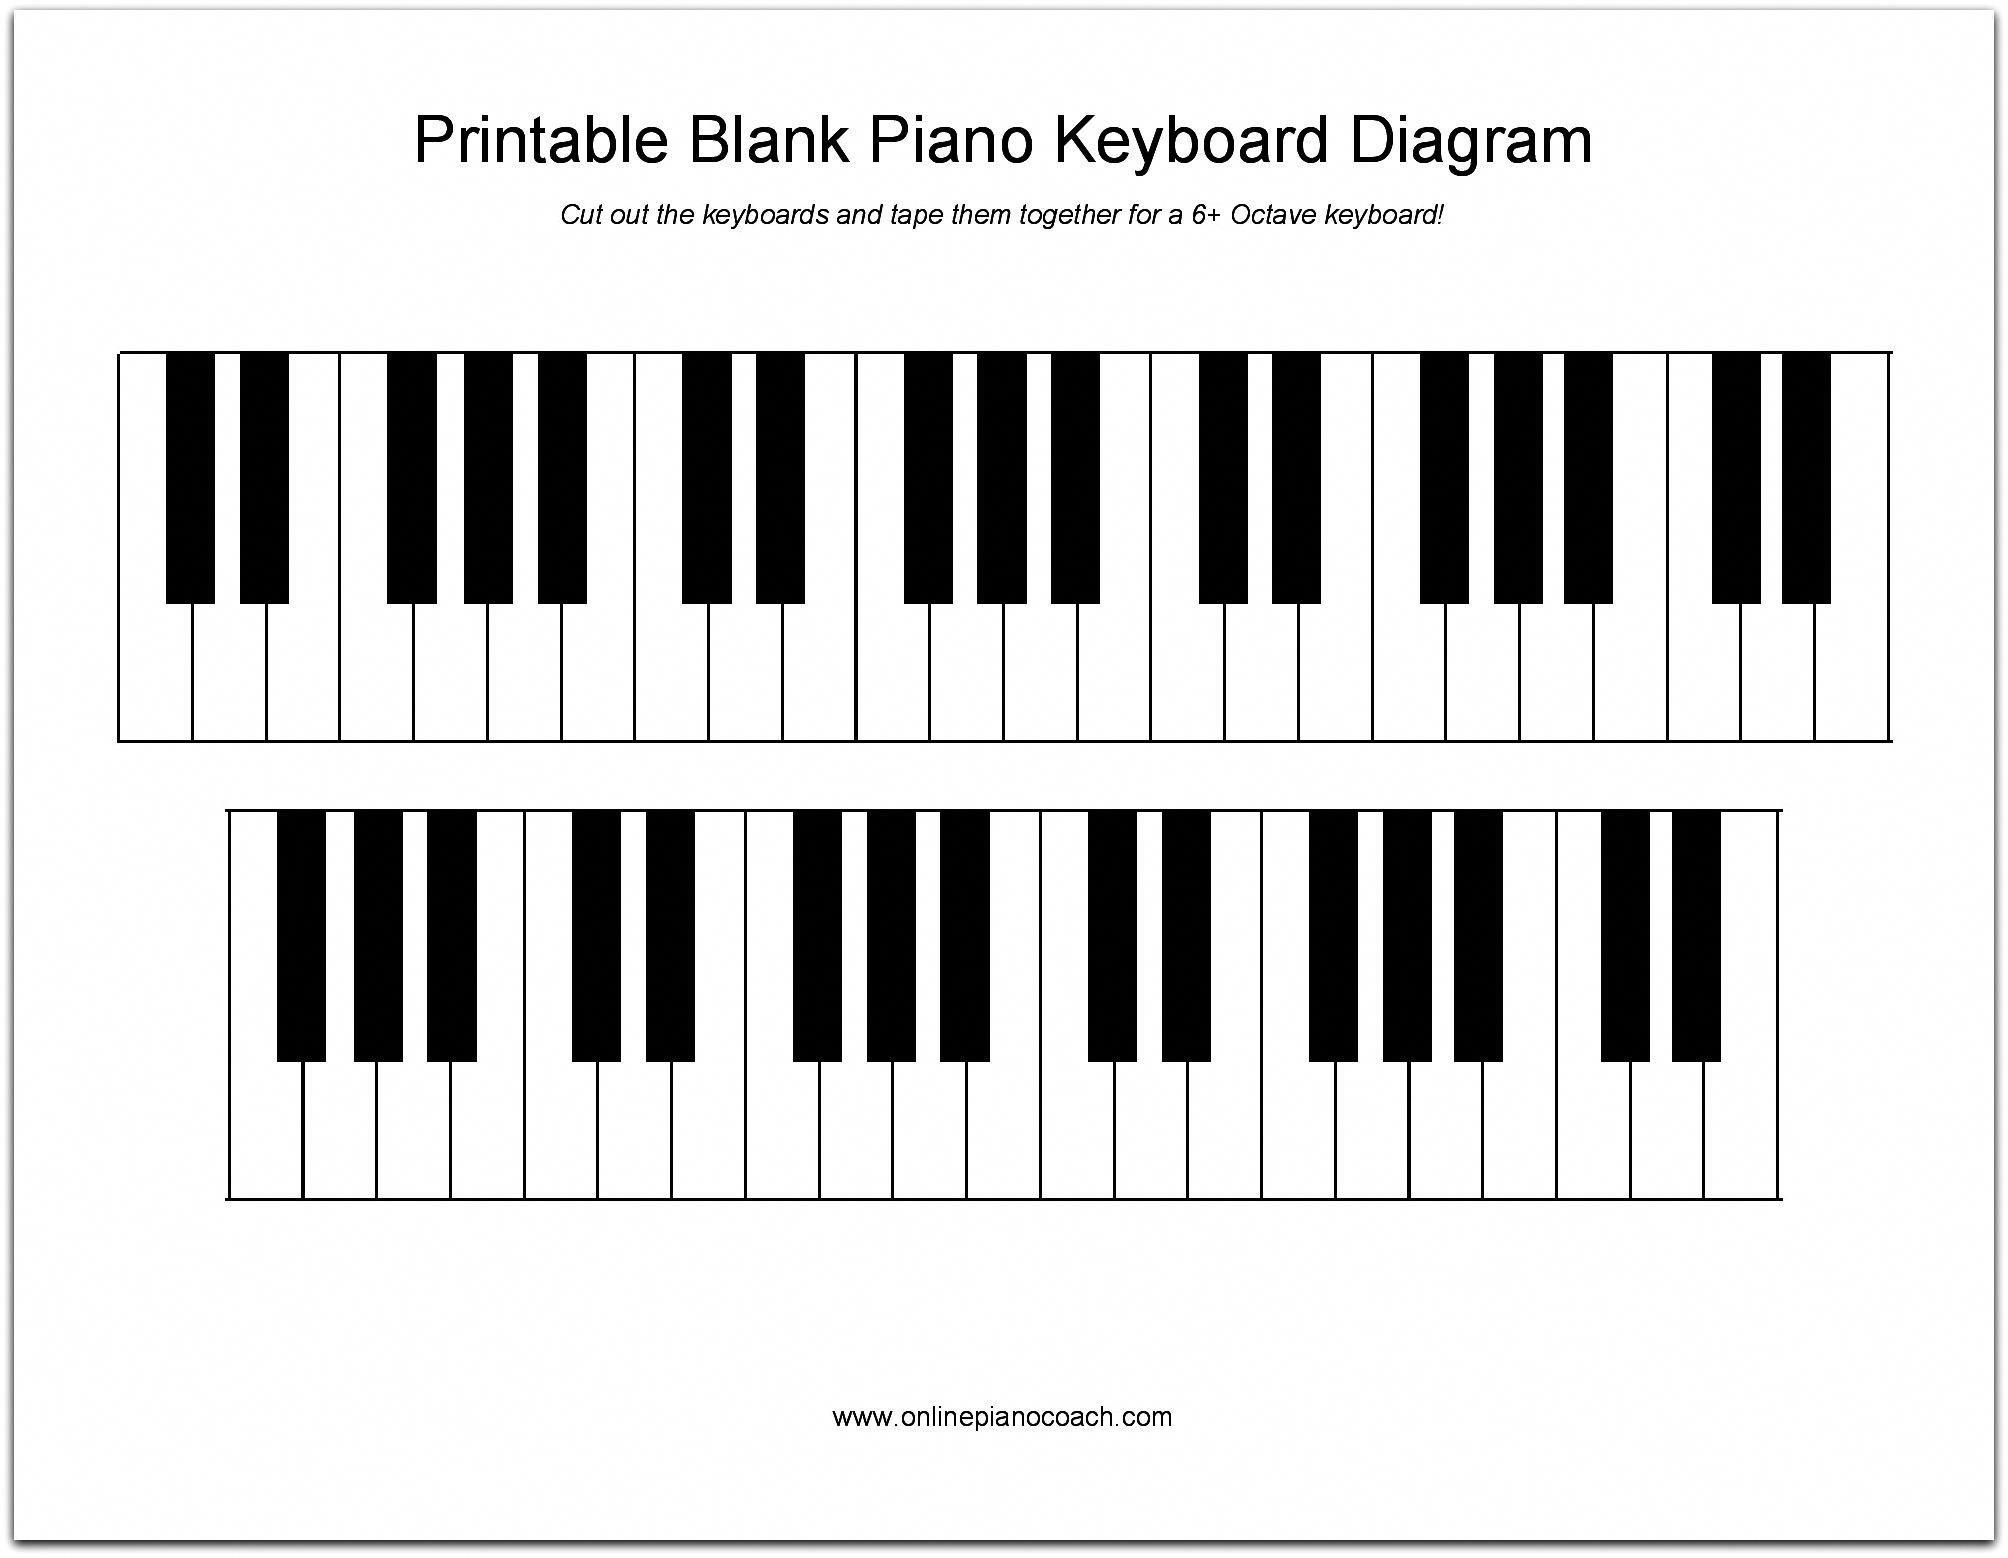 printable 88 key piano diagram wiring diagram schematics keyboard musical keys chart printable 88 key piano diagram [ 2008 x 1558 Pixel ]